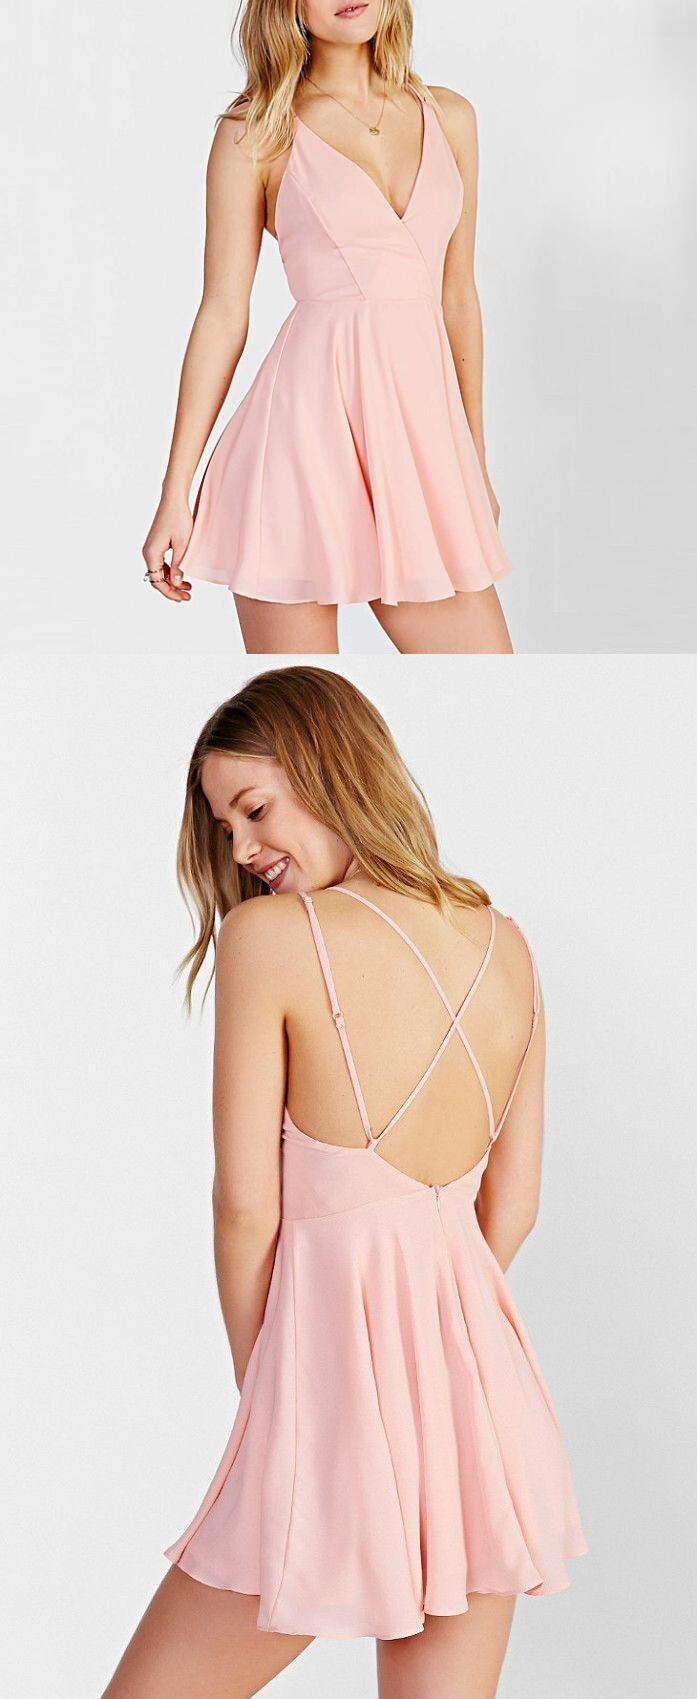 Best 25  Short dresses ideas on Pinterest | Dance dresses, Pink ...